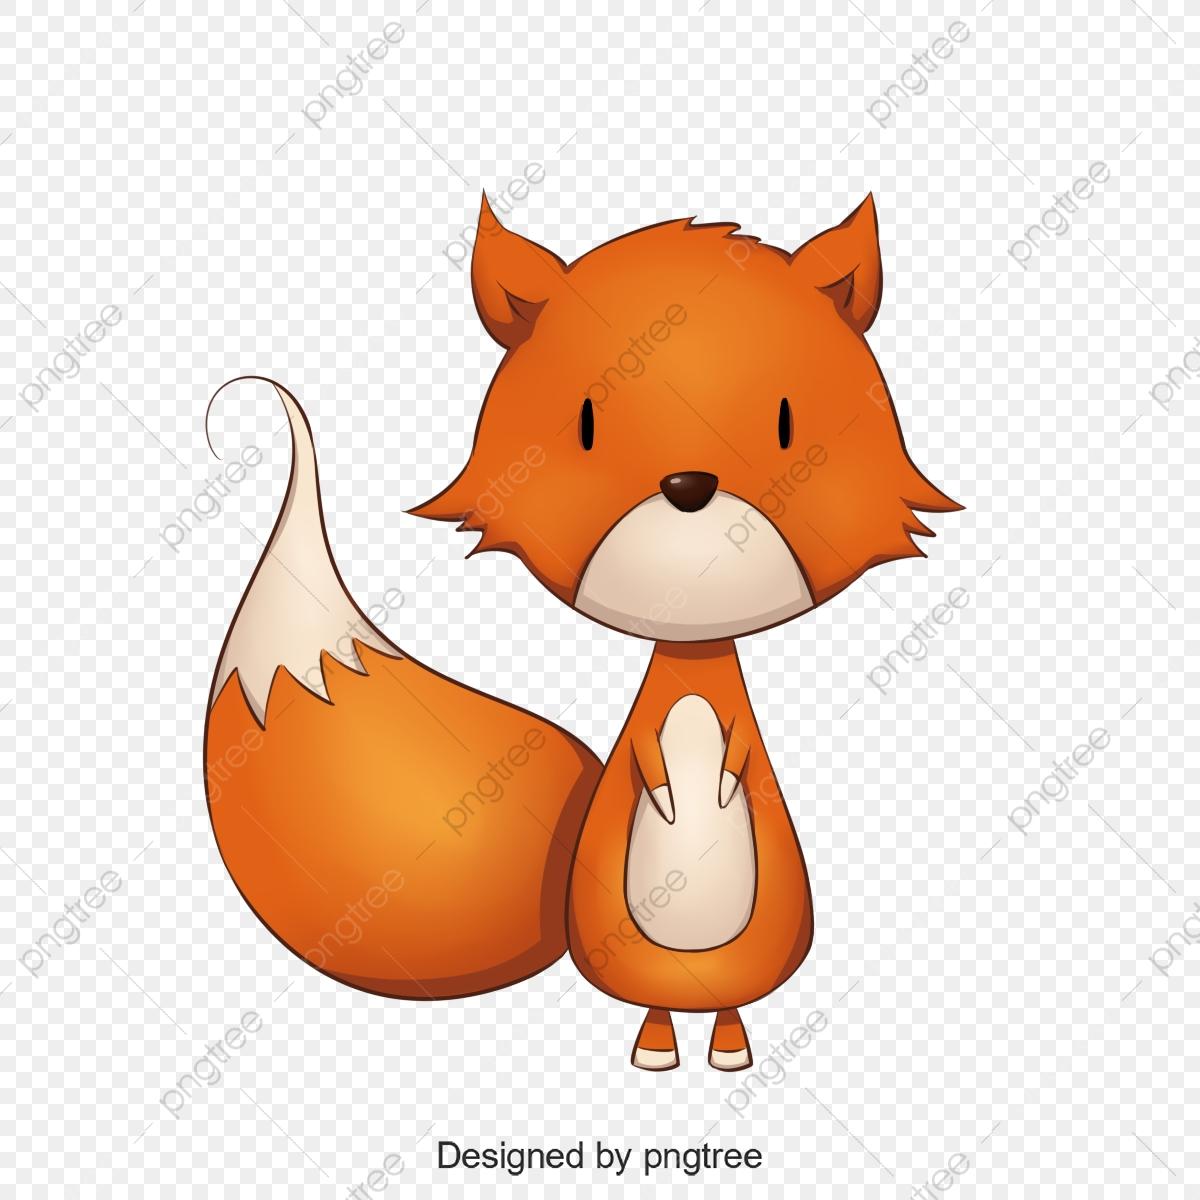 Little Fox, Fox Clipart, Baby Fox, Cute Fox PNG Transparent Clipart.